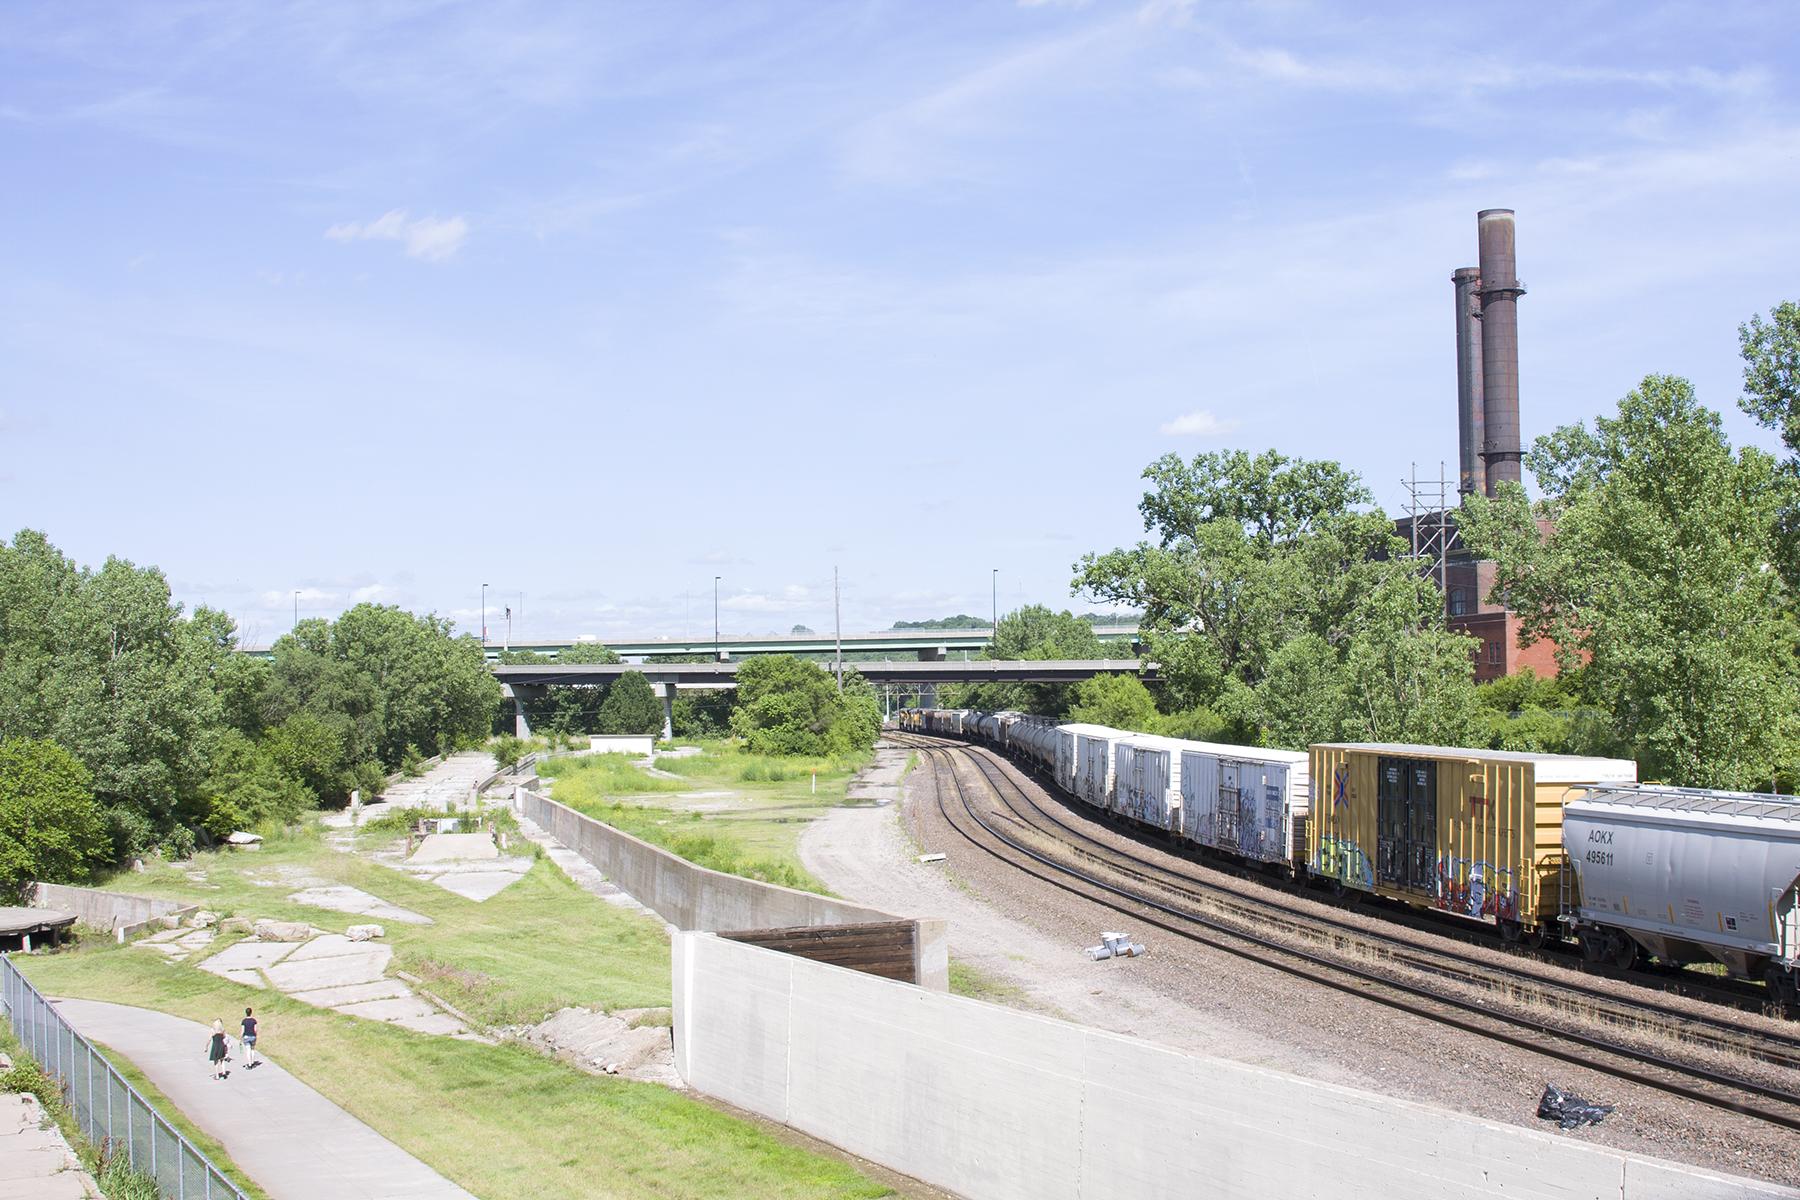 Riverfront Heritage Trail. Kansas City, Missouri. June, 2015